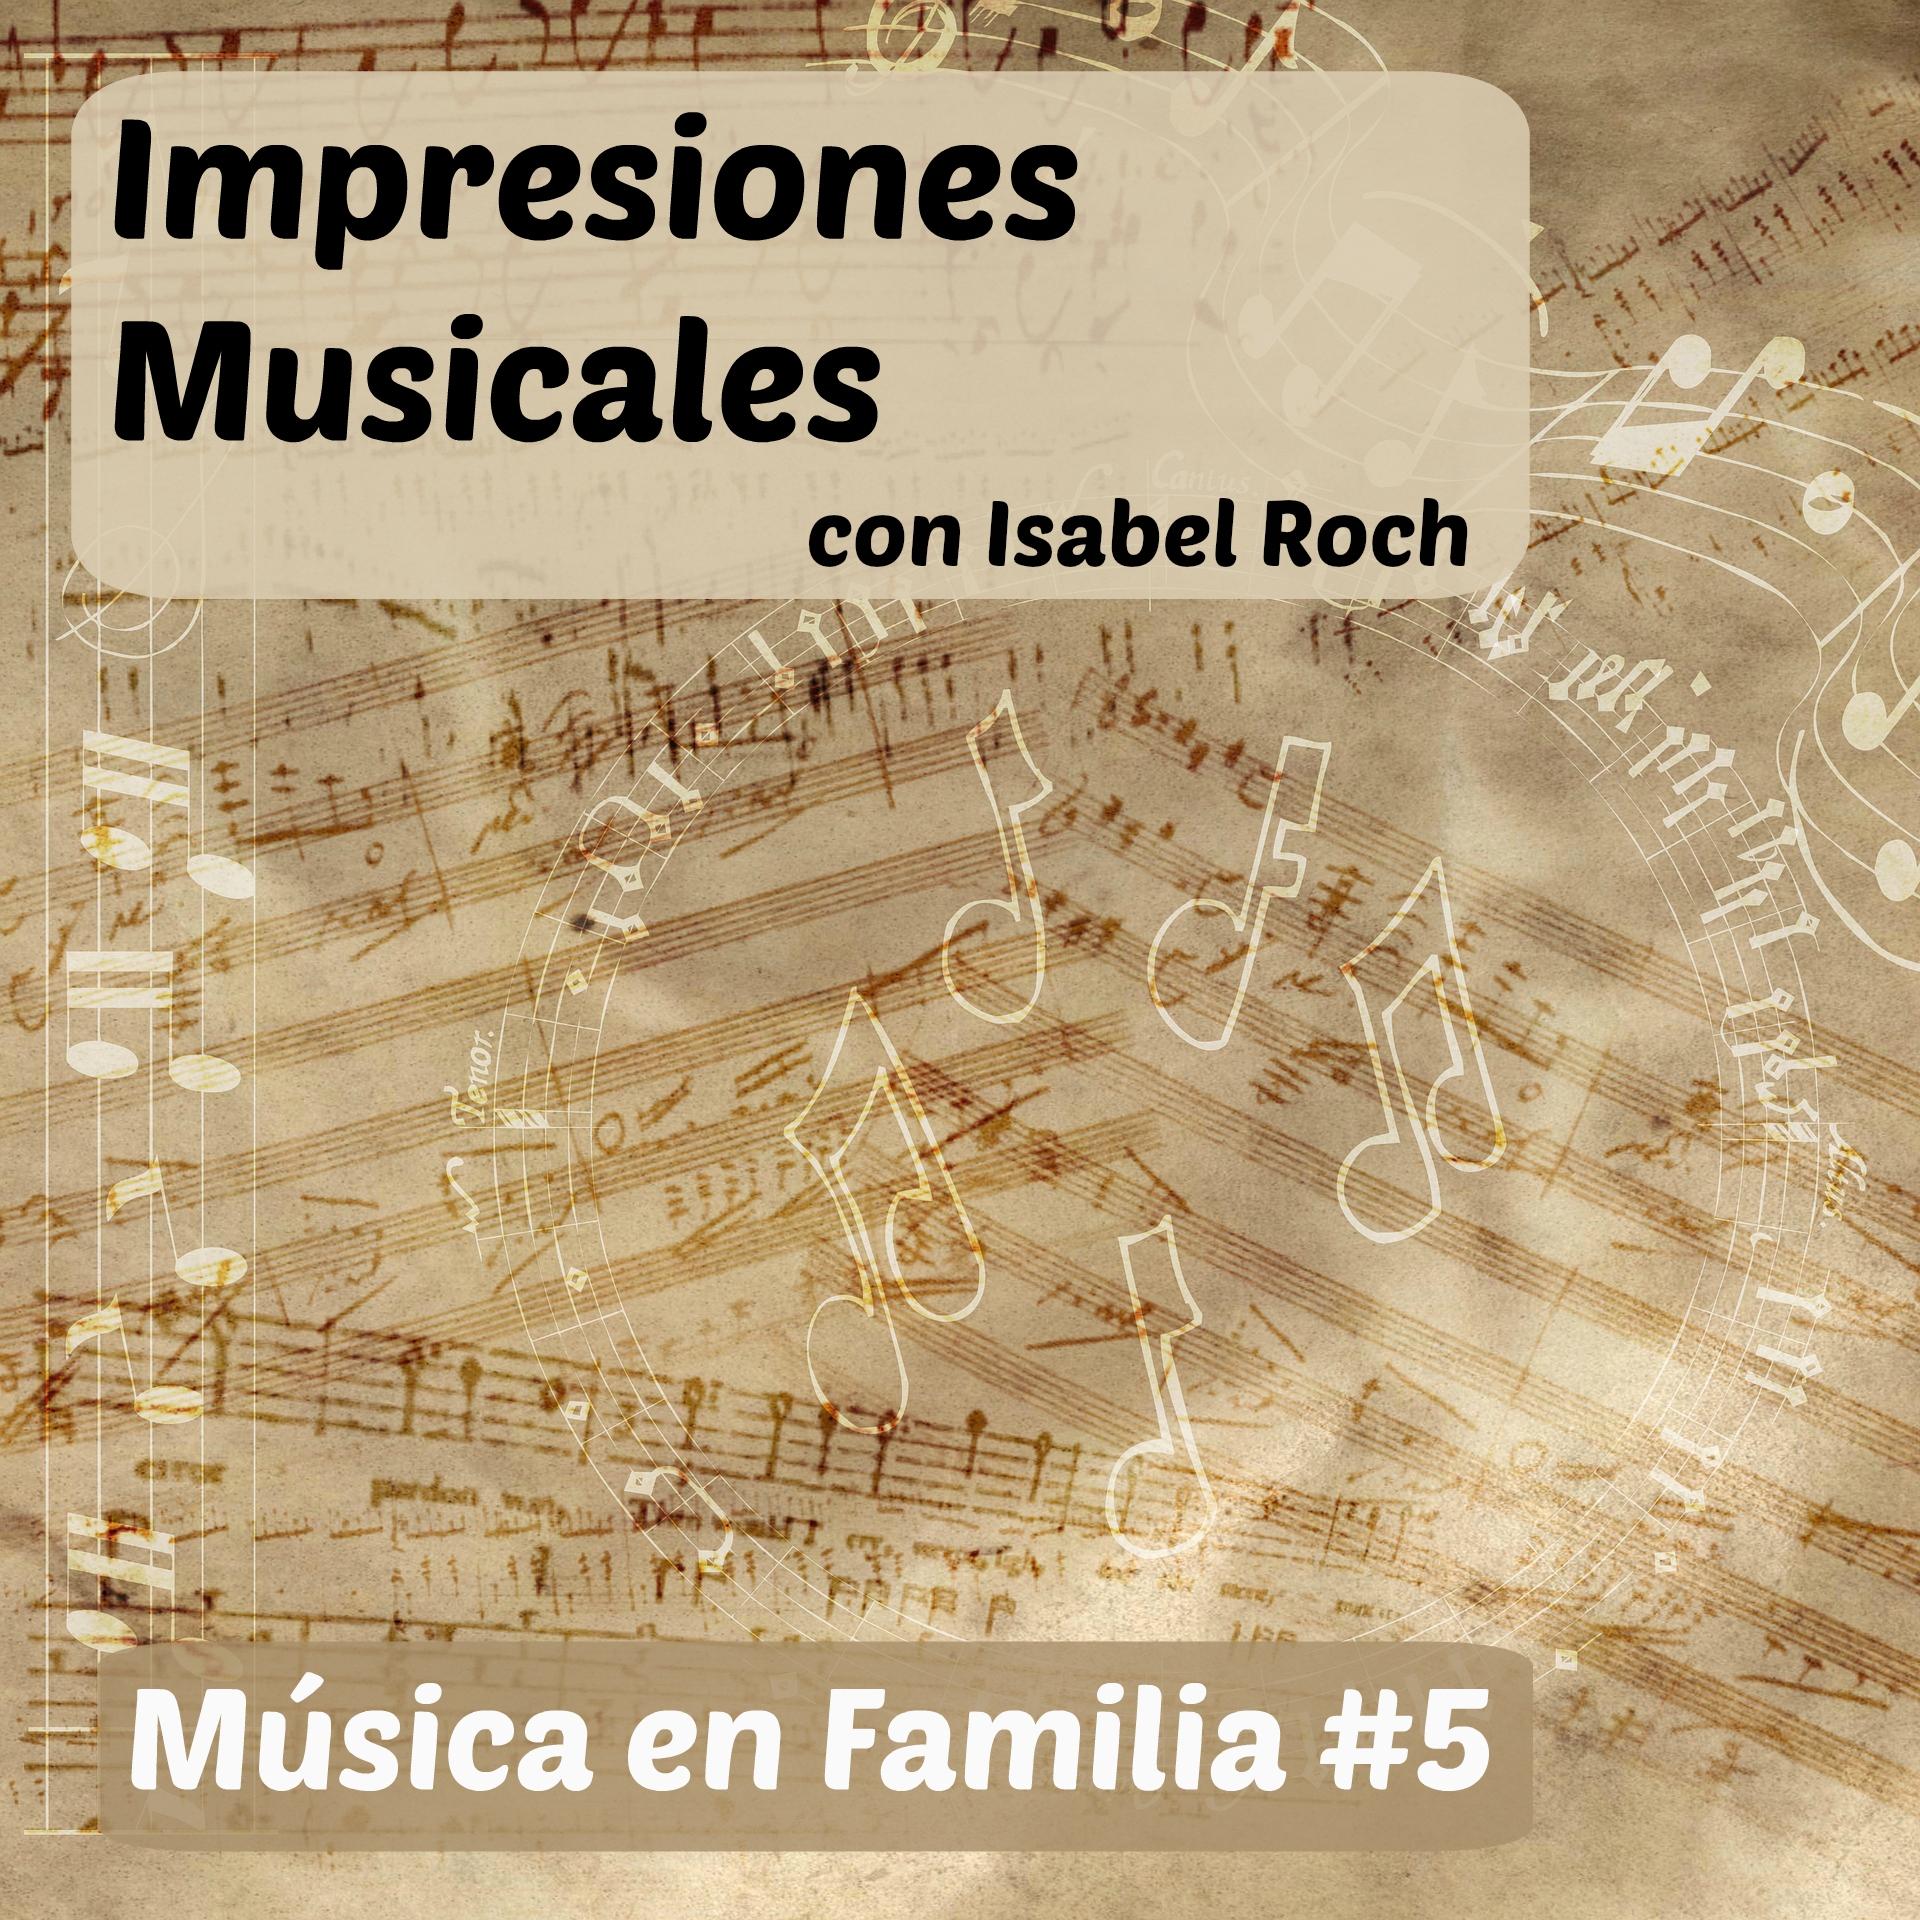 Foto MeF#5 Impresiones Musicales